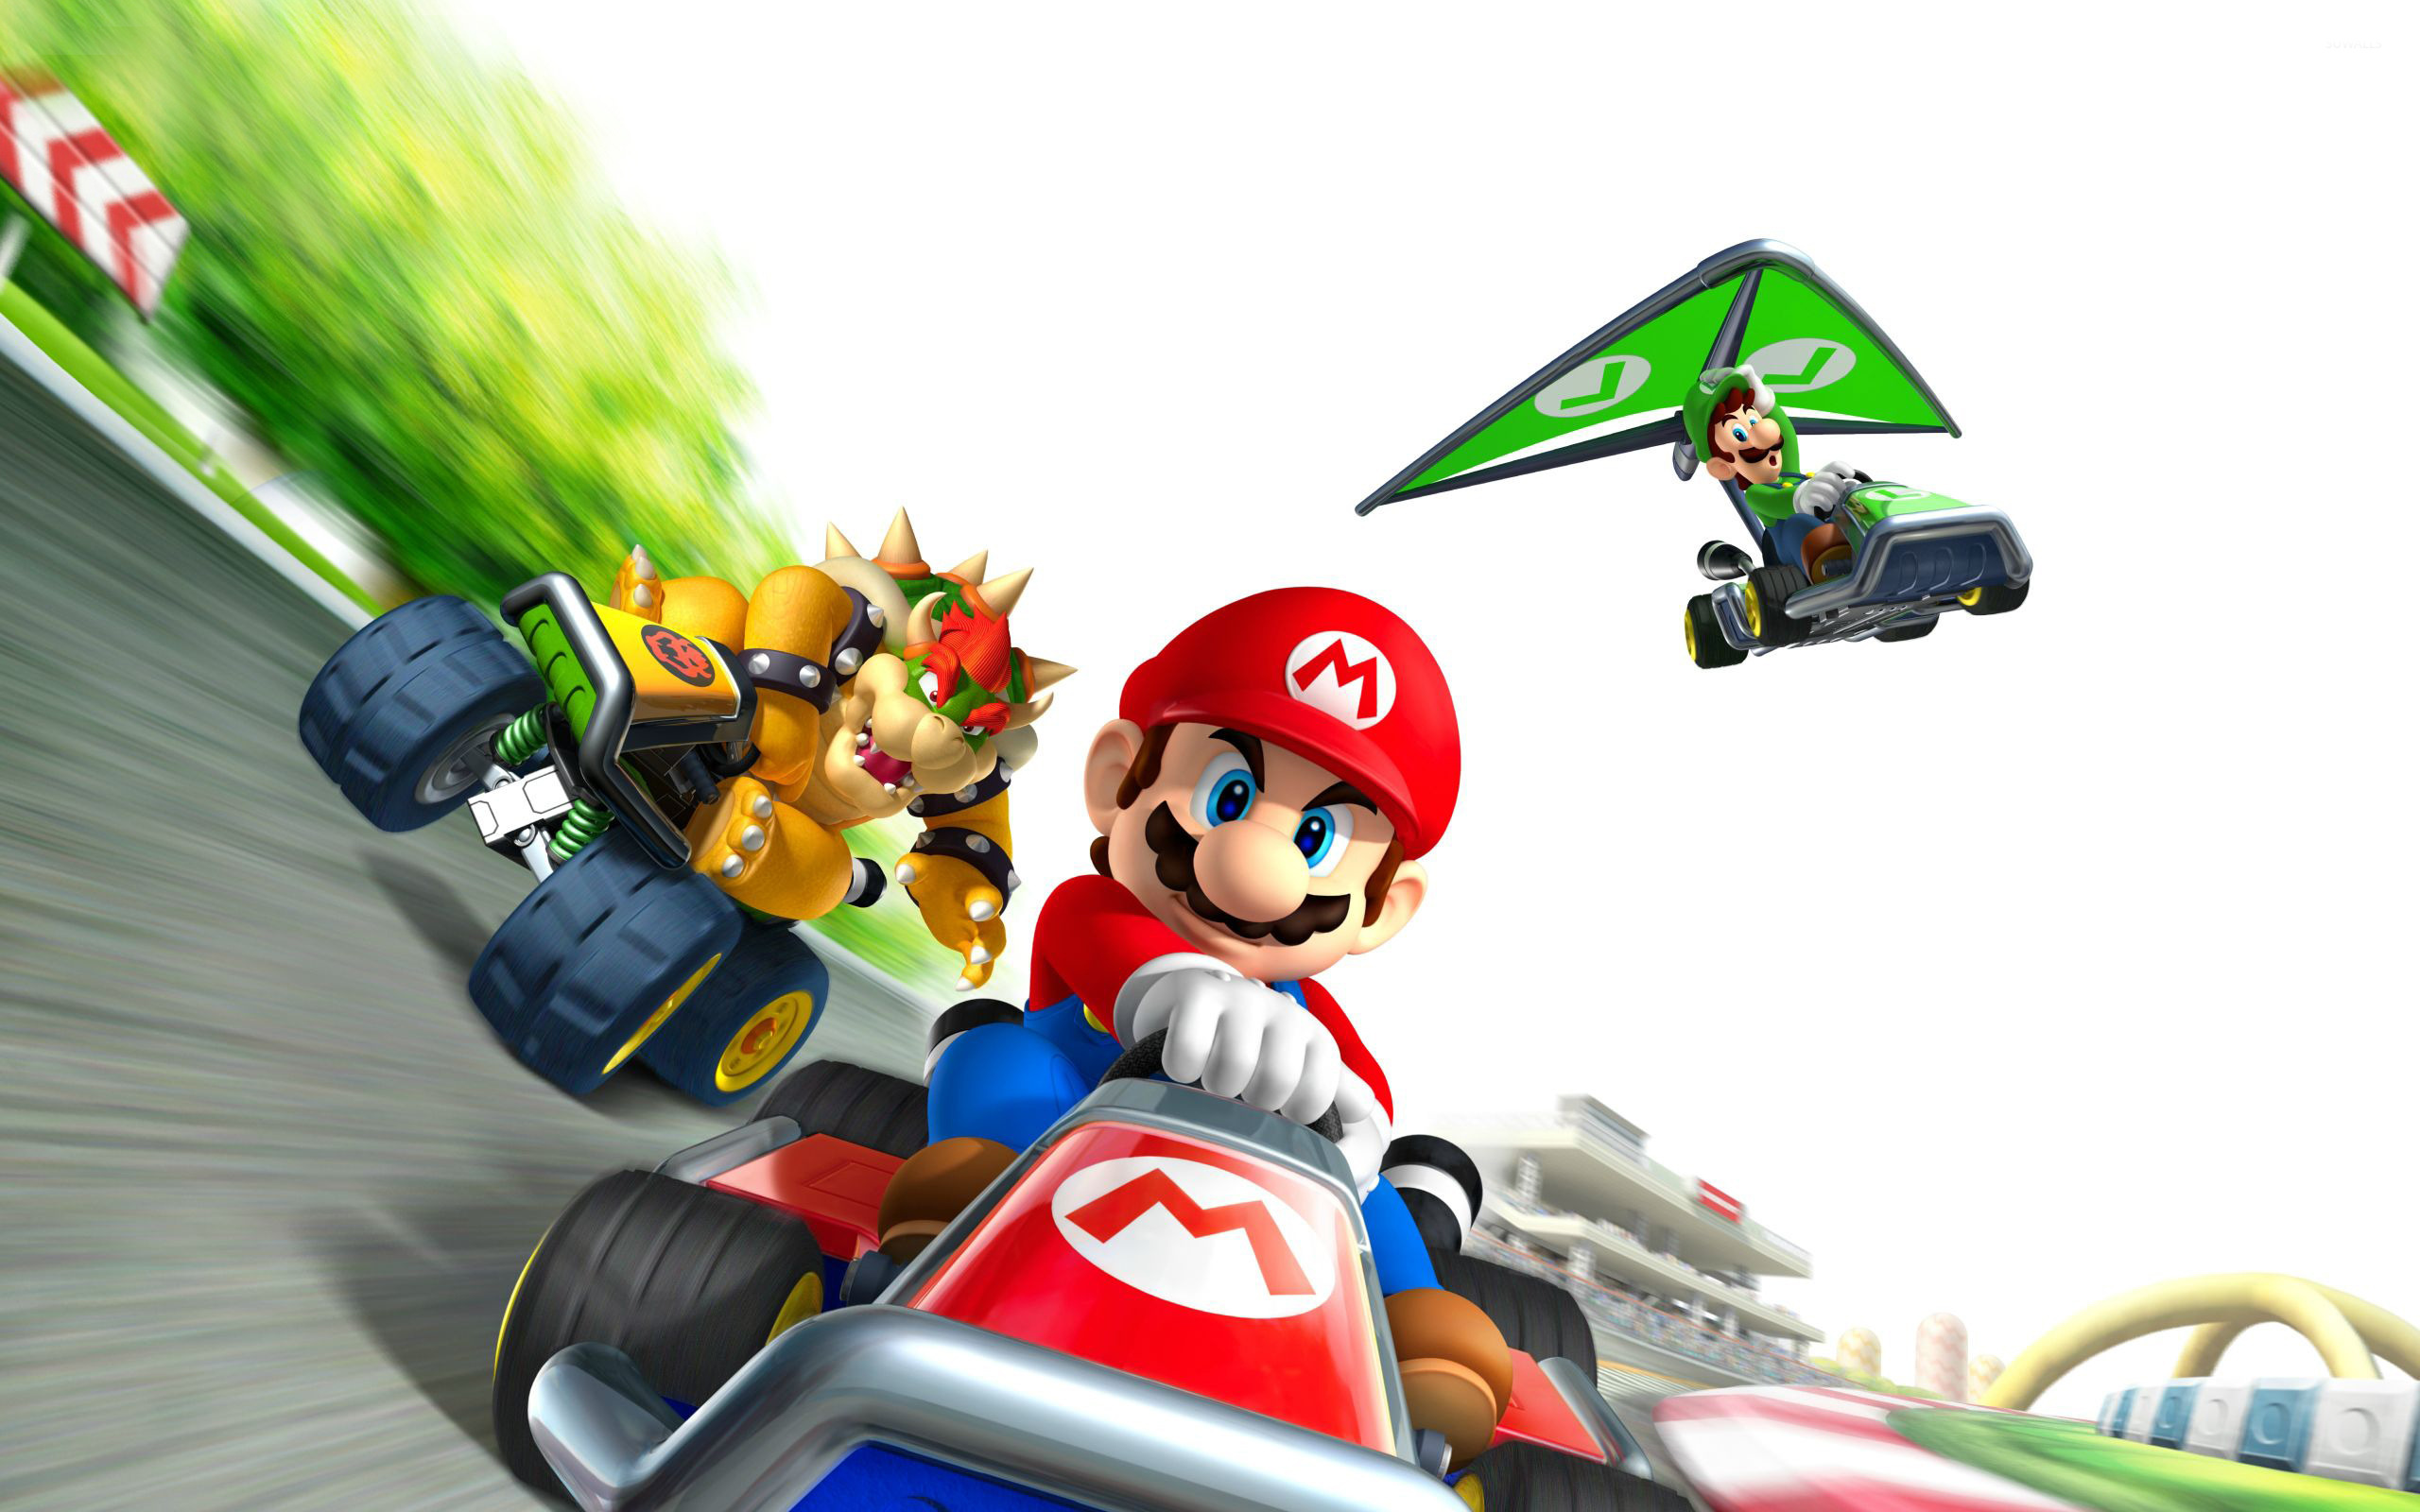 Mario kart download free / Yogahop pasadena